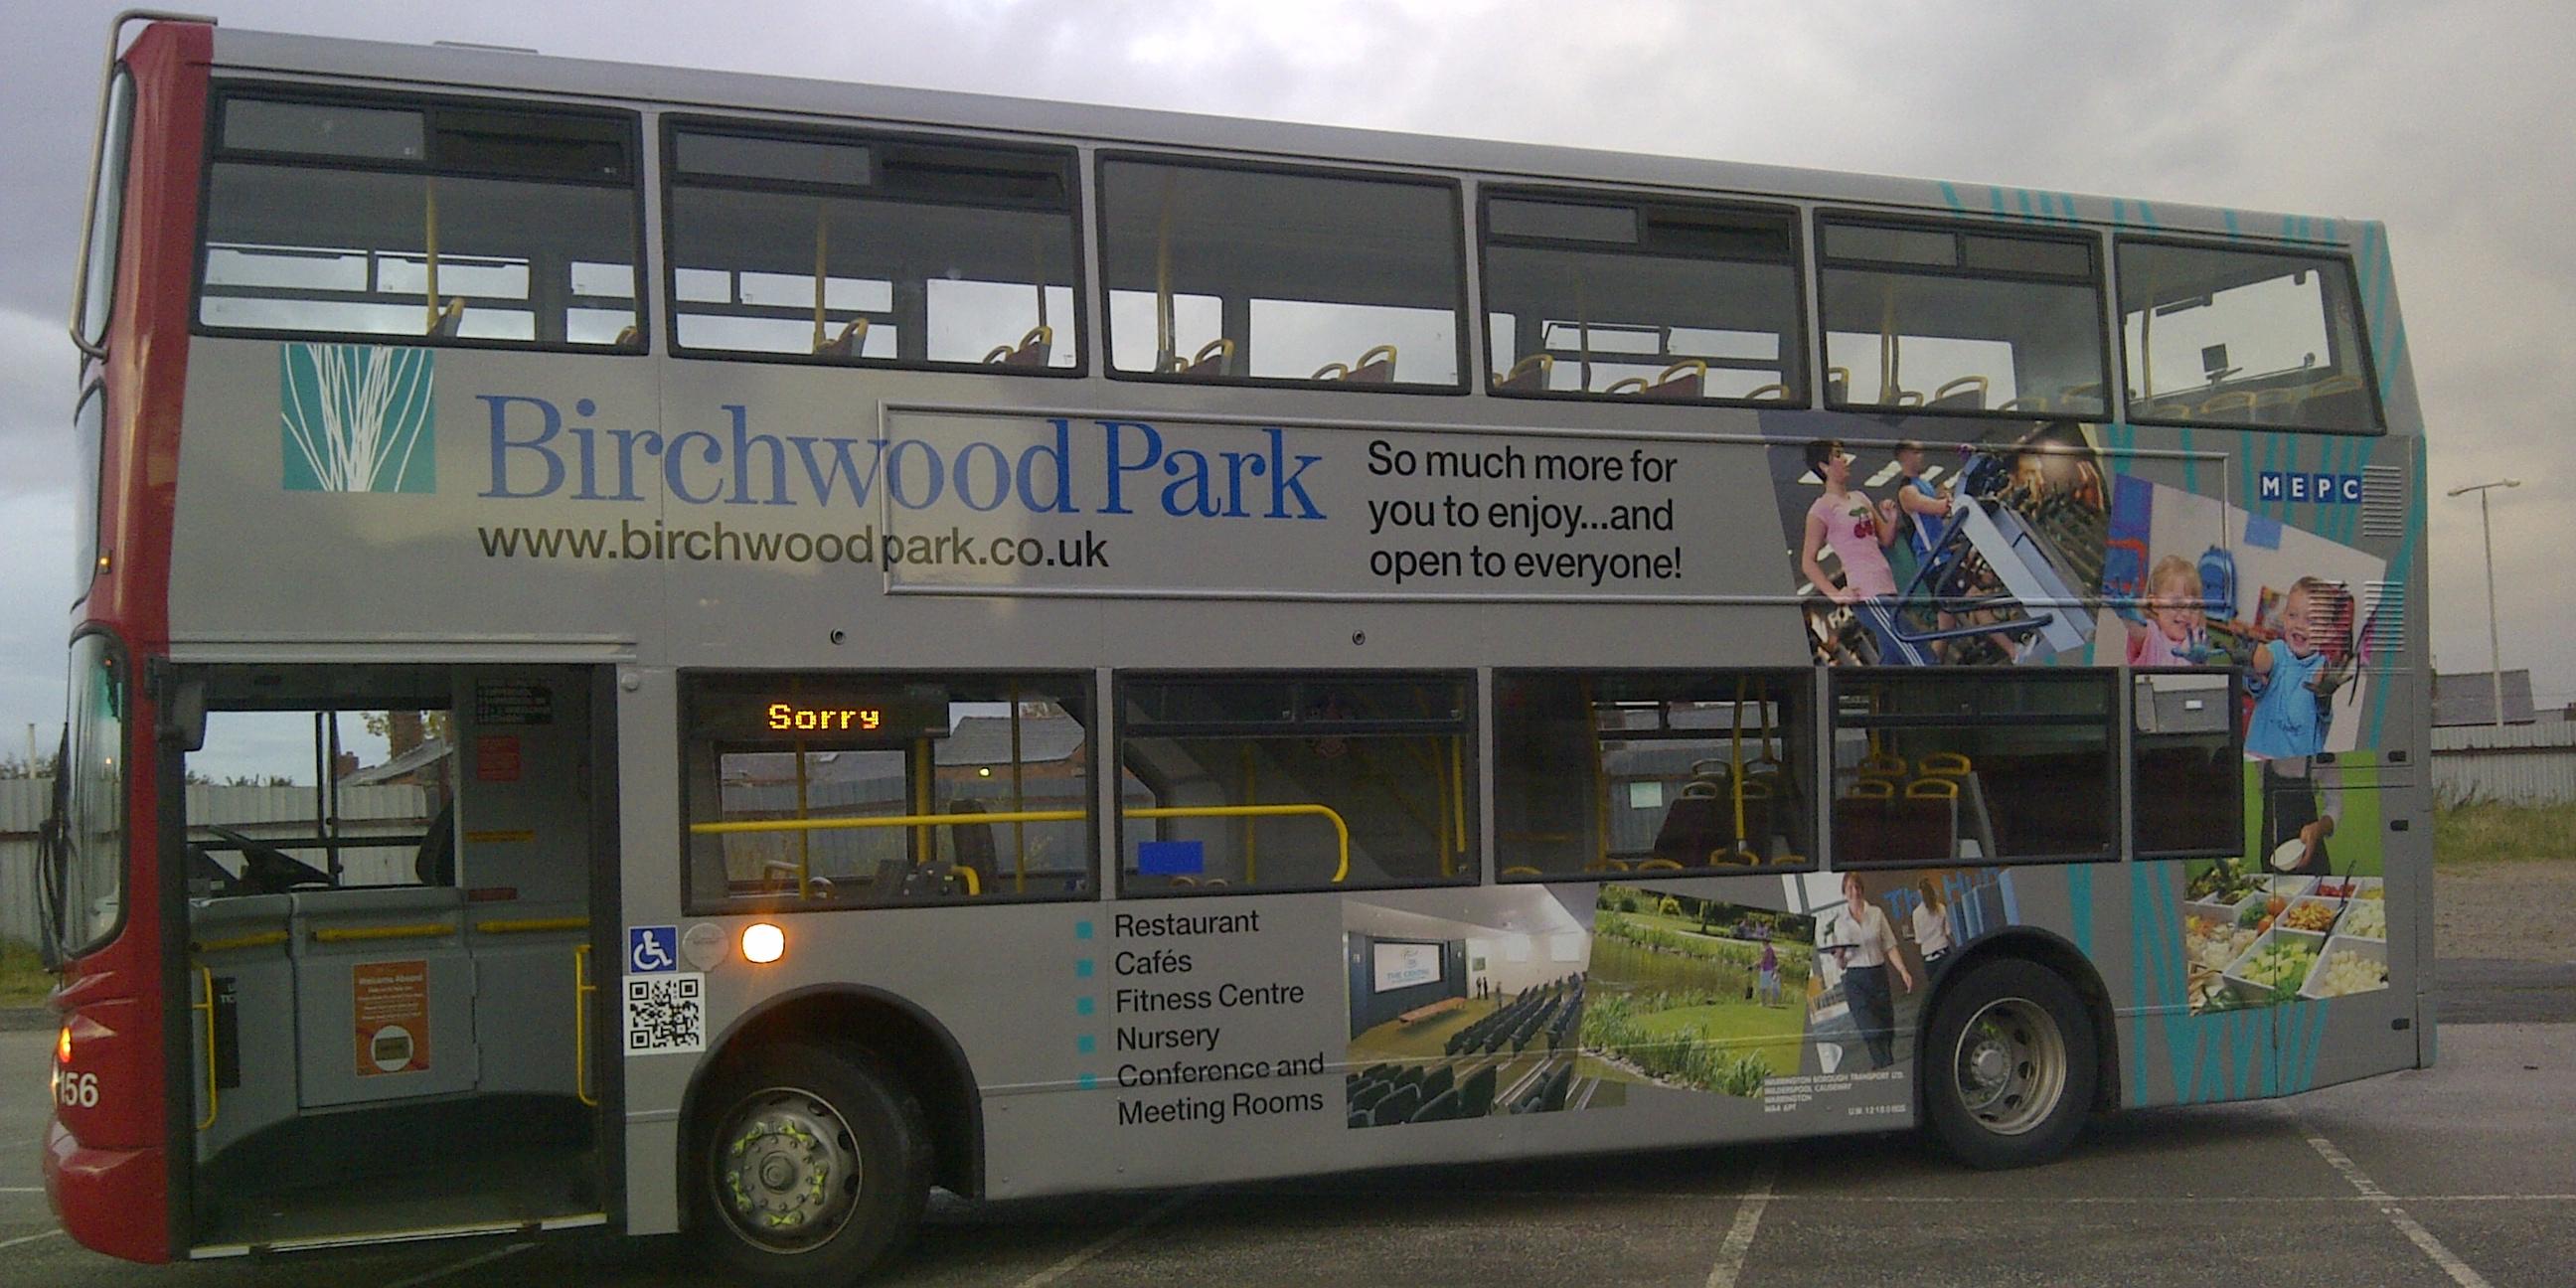 Bus Advertisements